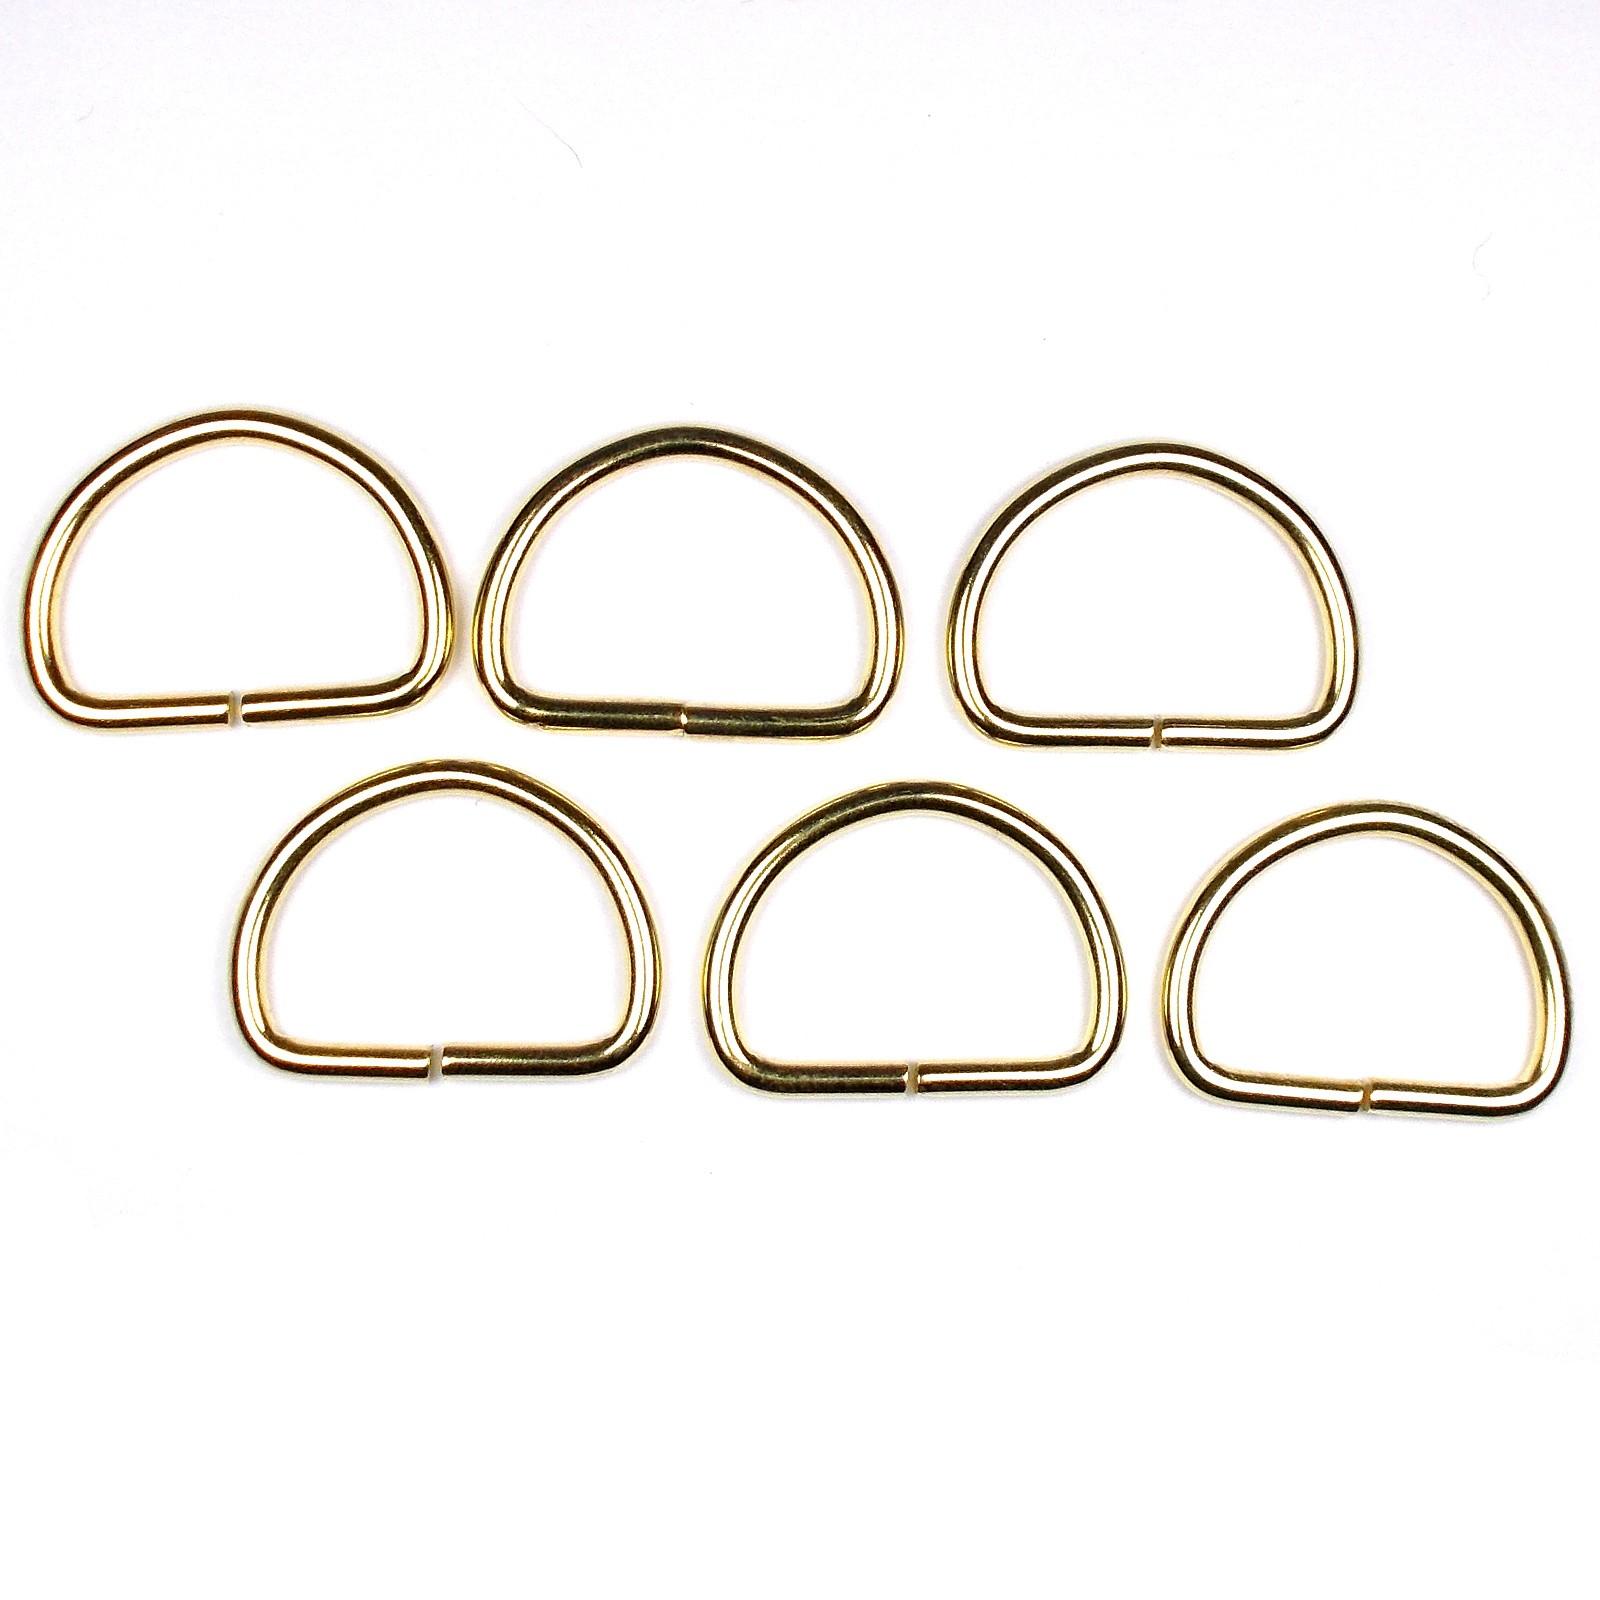 Gold Metal D Rings 26mm Pack of 6